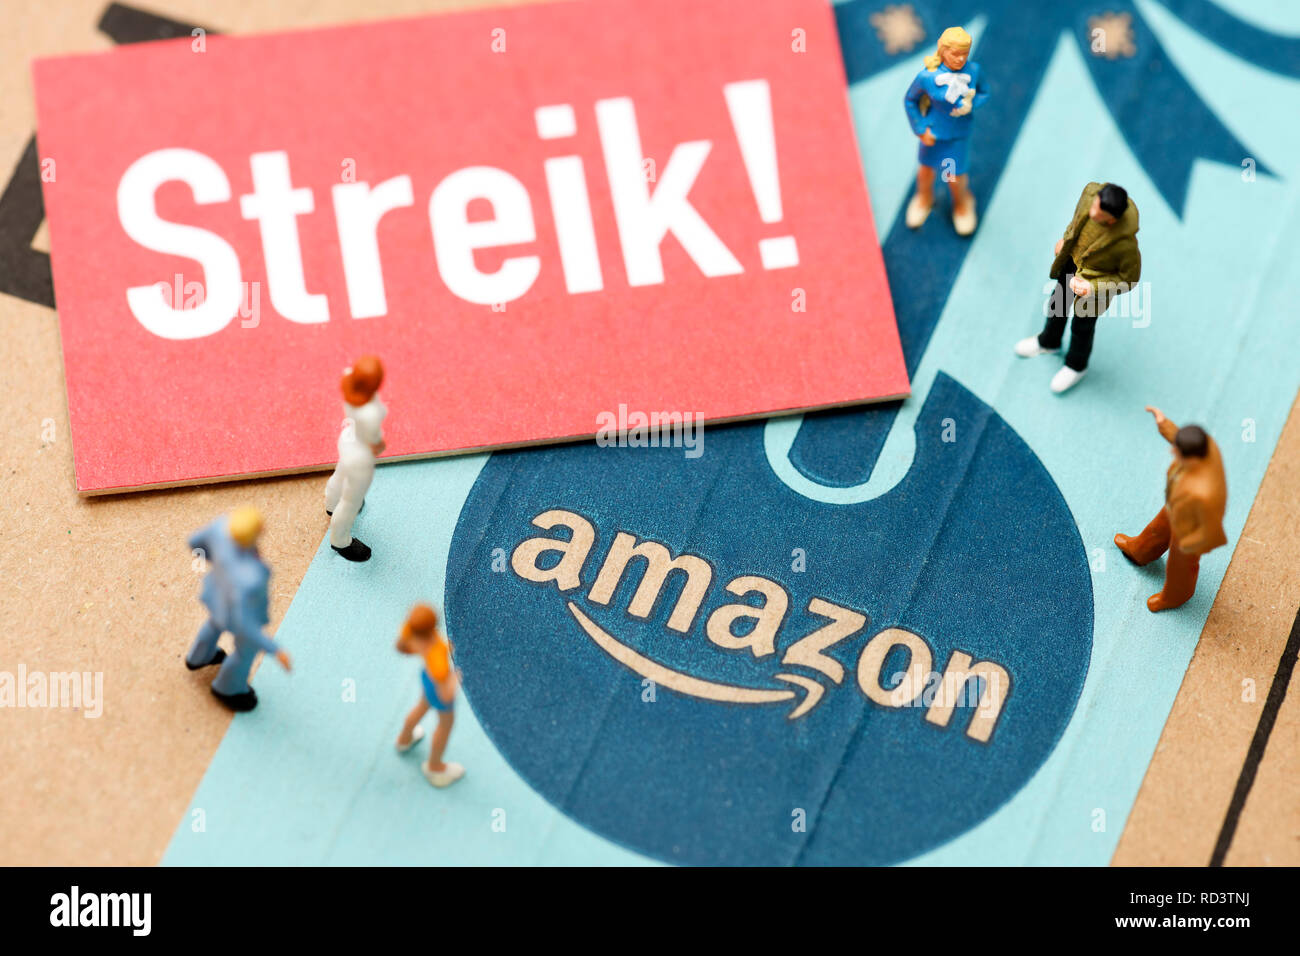 Strike sign and miniature figures on Amazon package, Streik-Schild und Miniaturfiguren auf Amazon-Paket - Stock Image